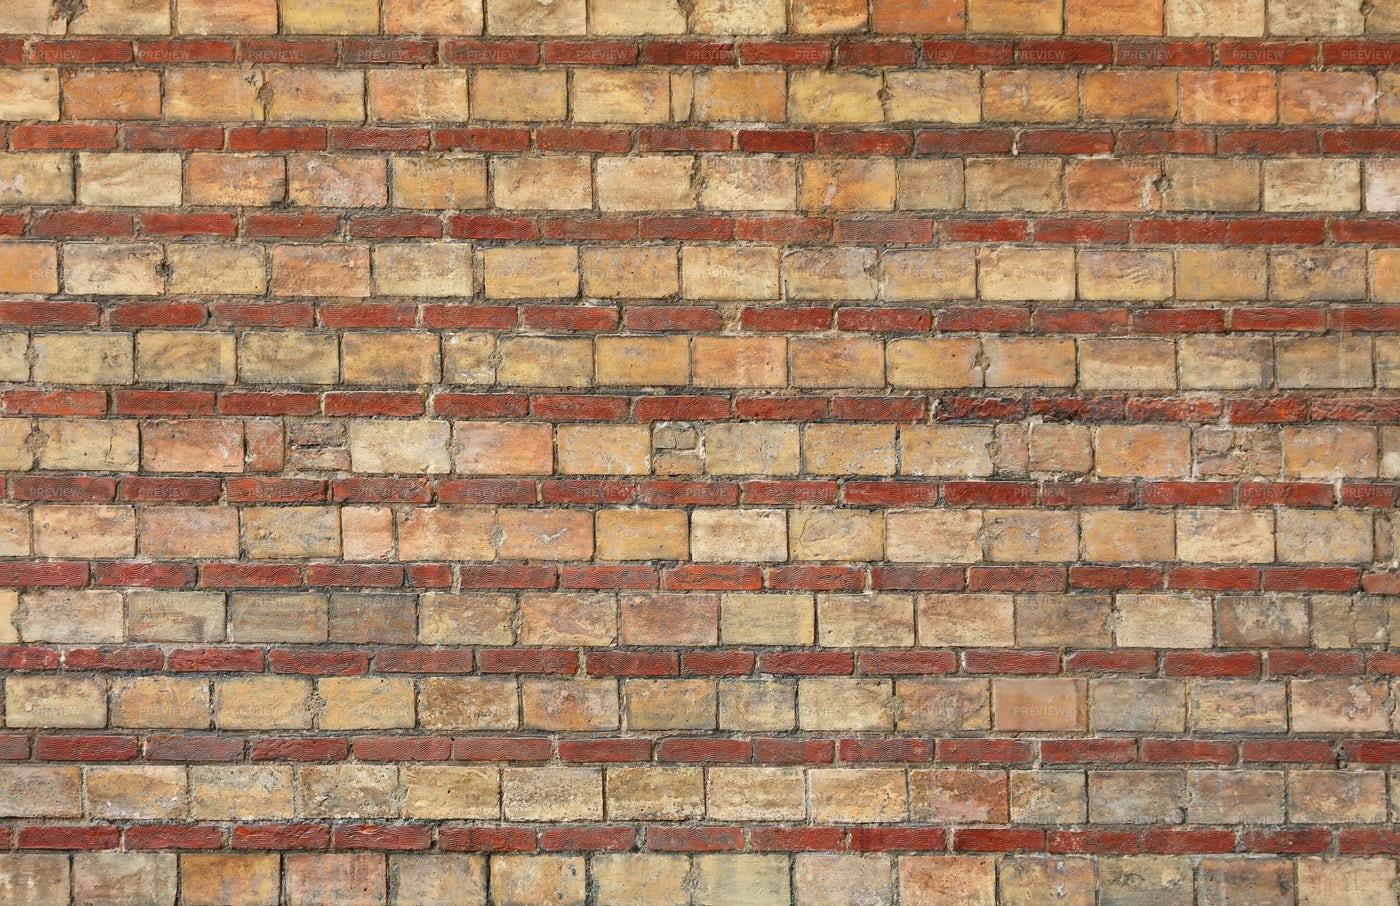 Red Brown Brick Wall: Stock Photos